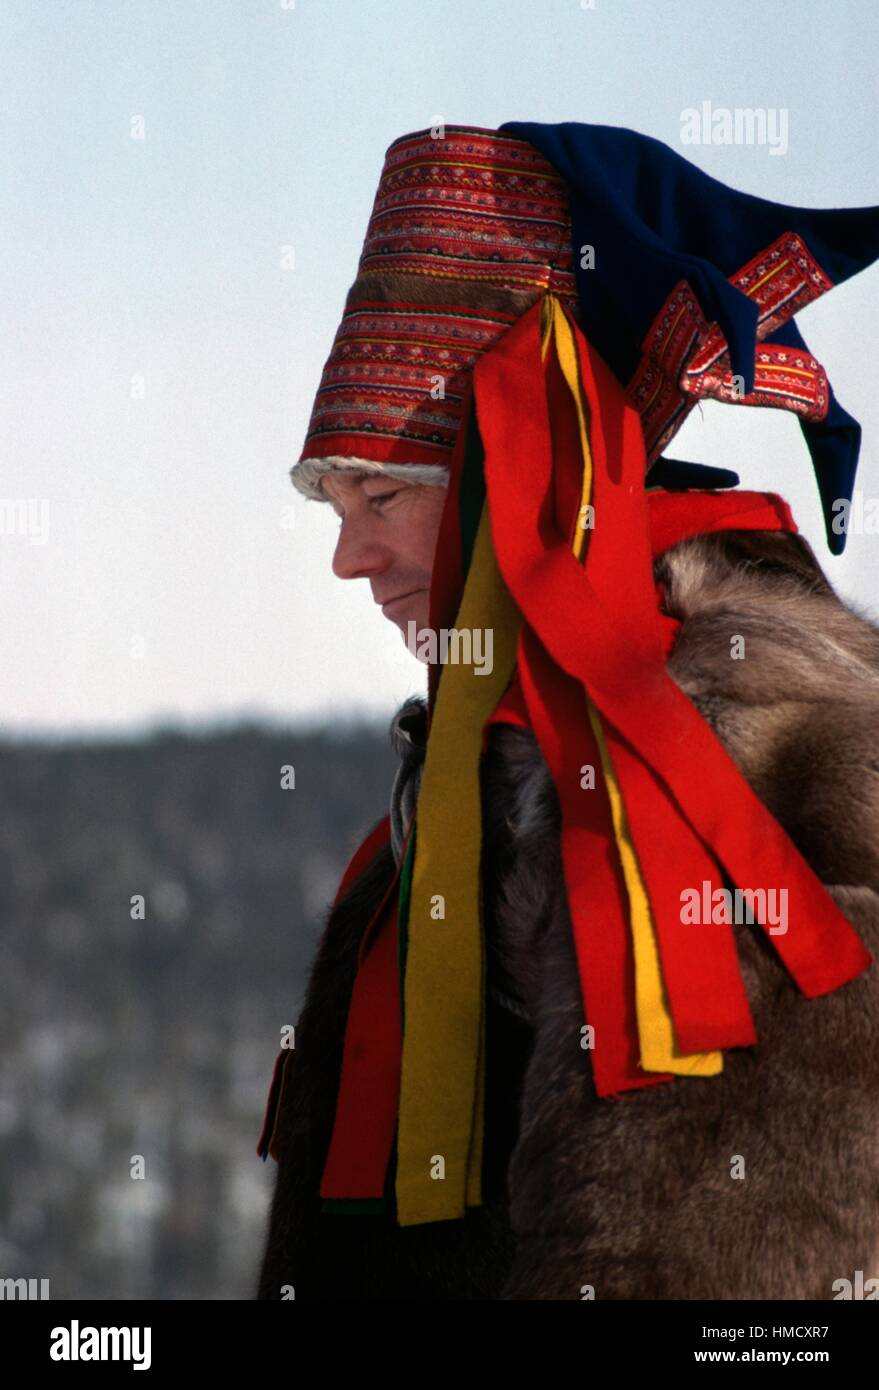 Sami (Laplander) wearing traditional clothes, Inari, Finland. - Stock Image